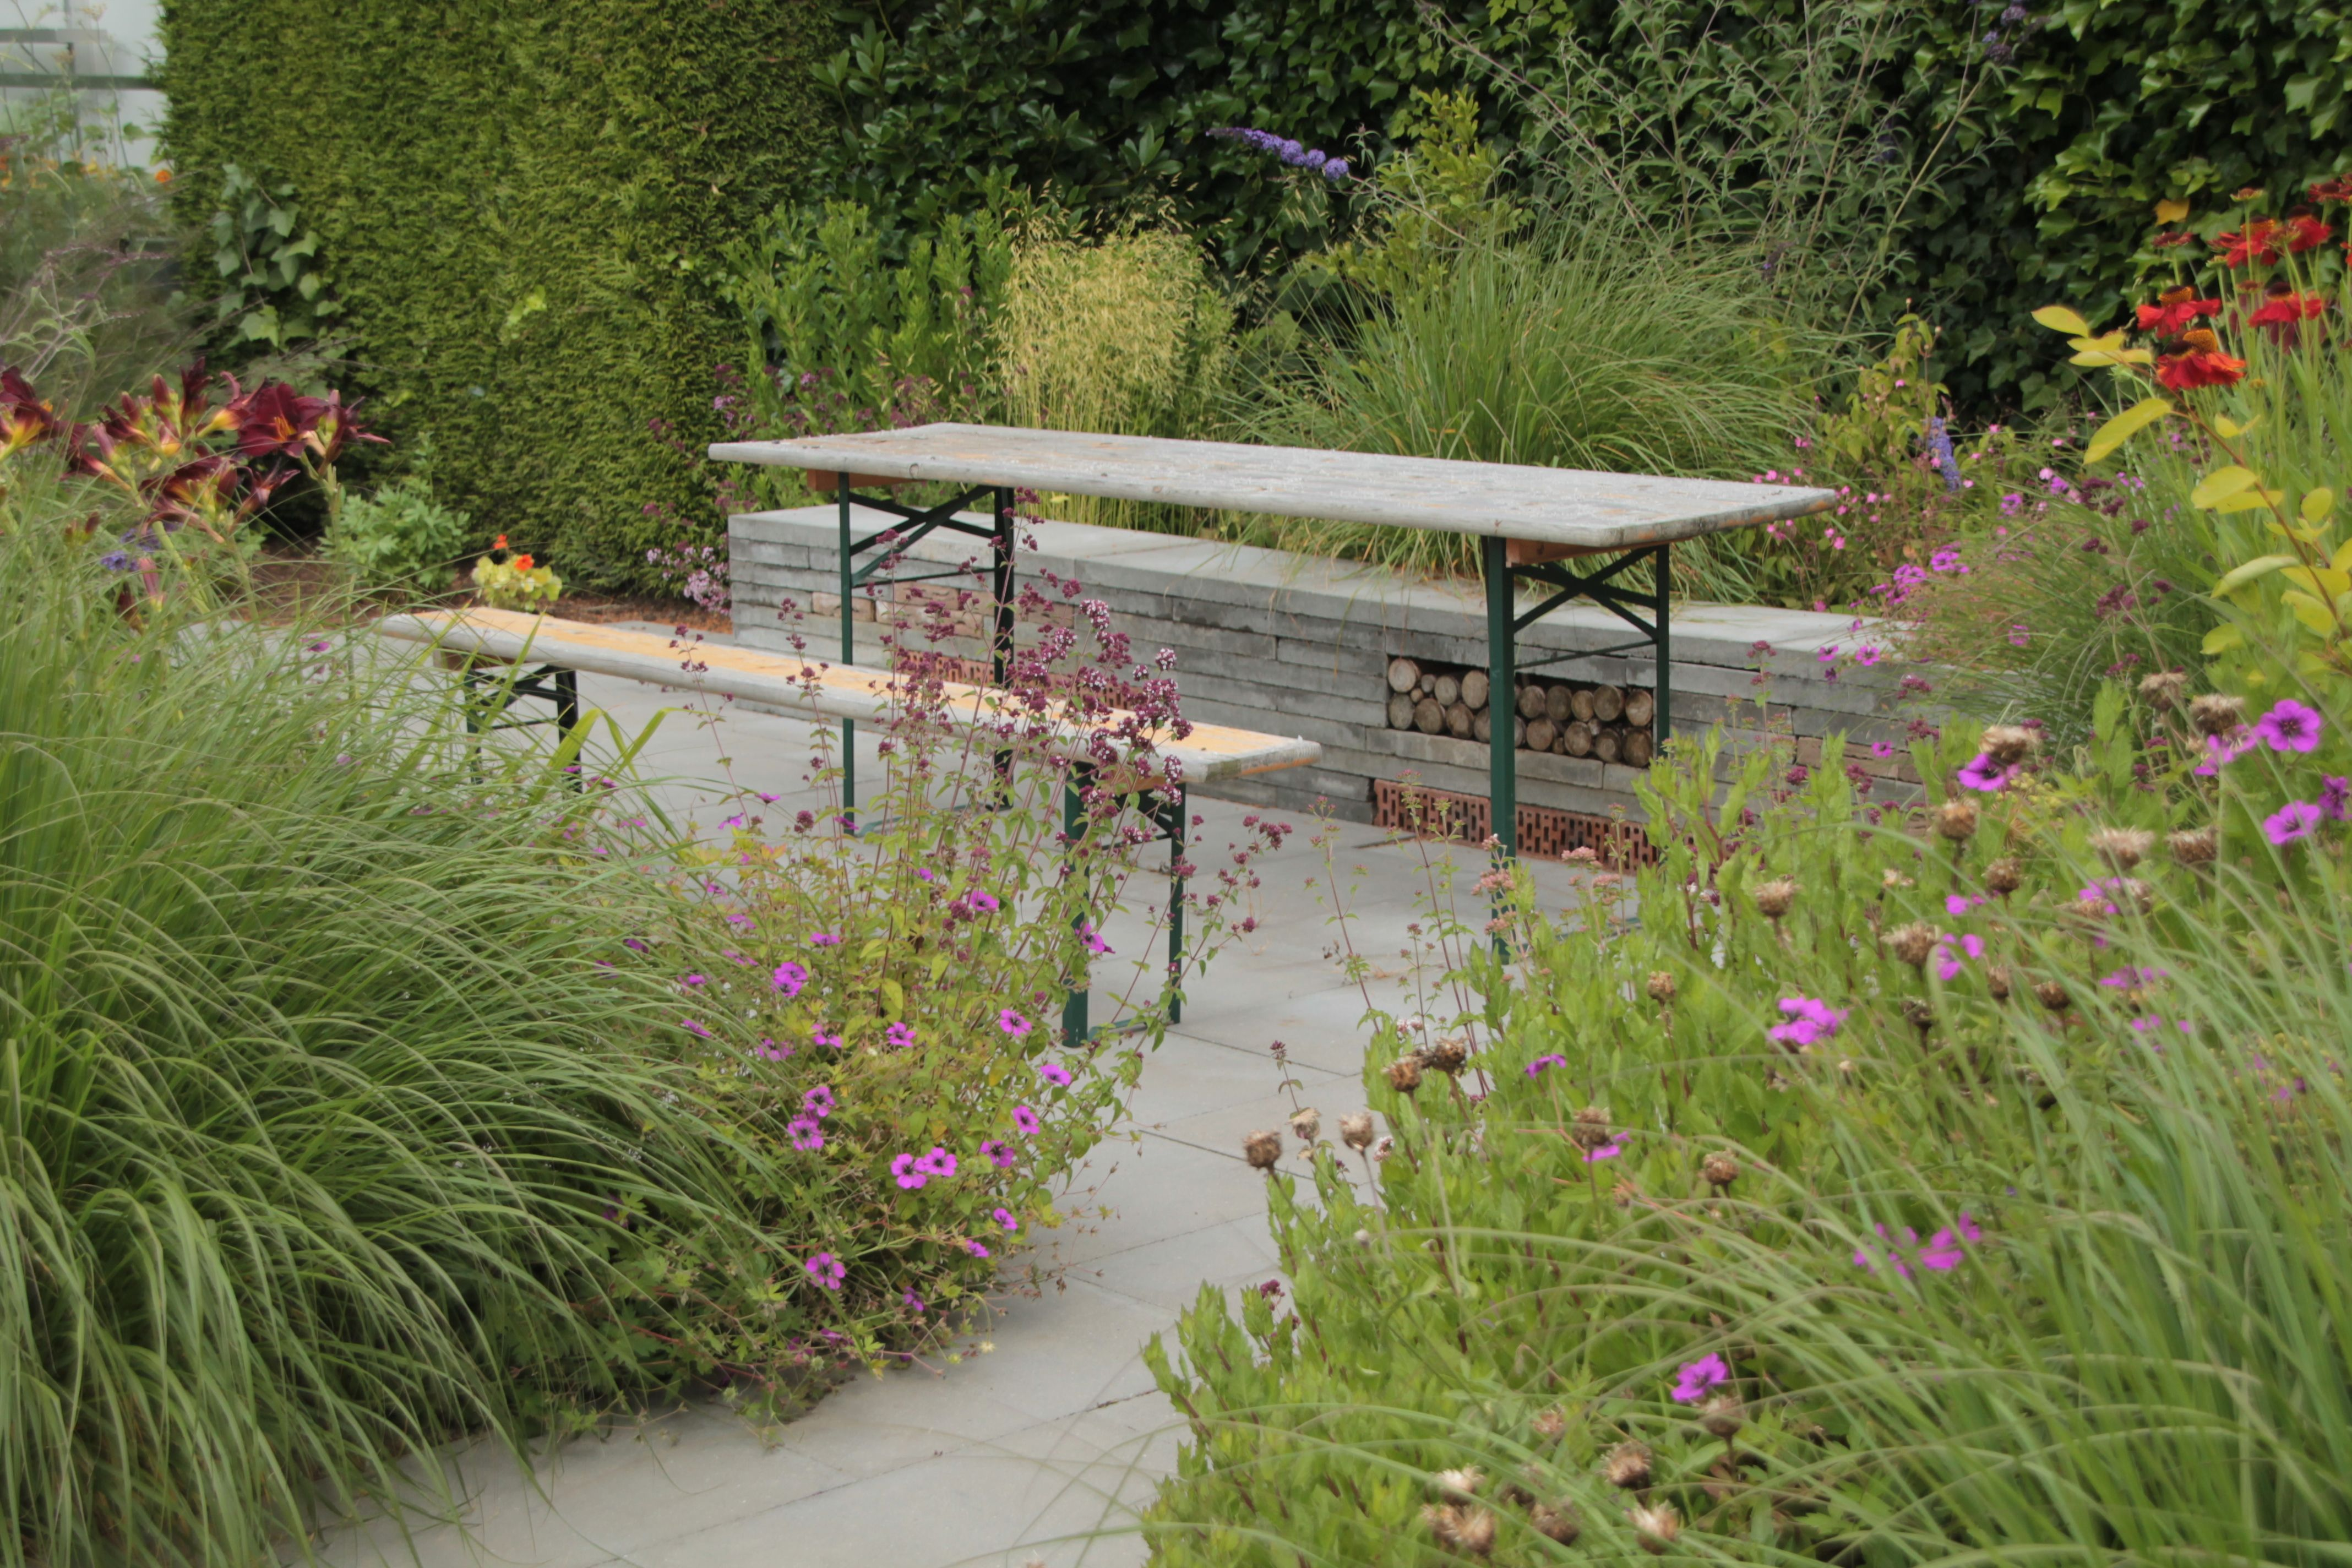 De Inclusieve Tuin Design Carrie Preston Studio Toop And Jasper Helmantel Cruydt Hoeck In Collaboration Wit Garden Images Small Courtyards Outdoor Living